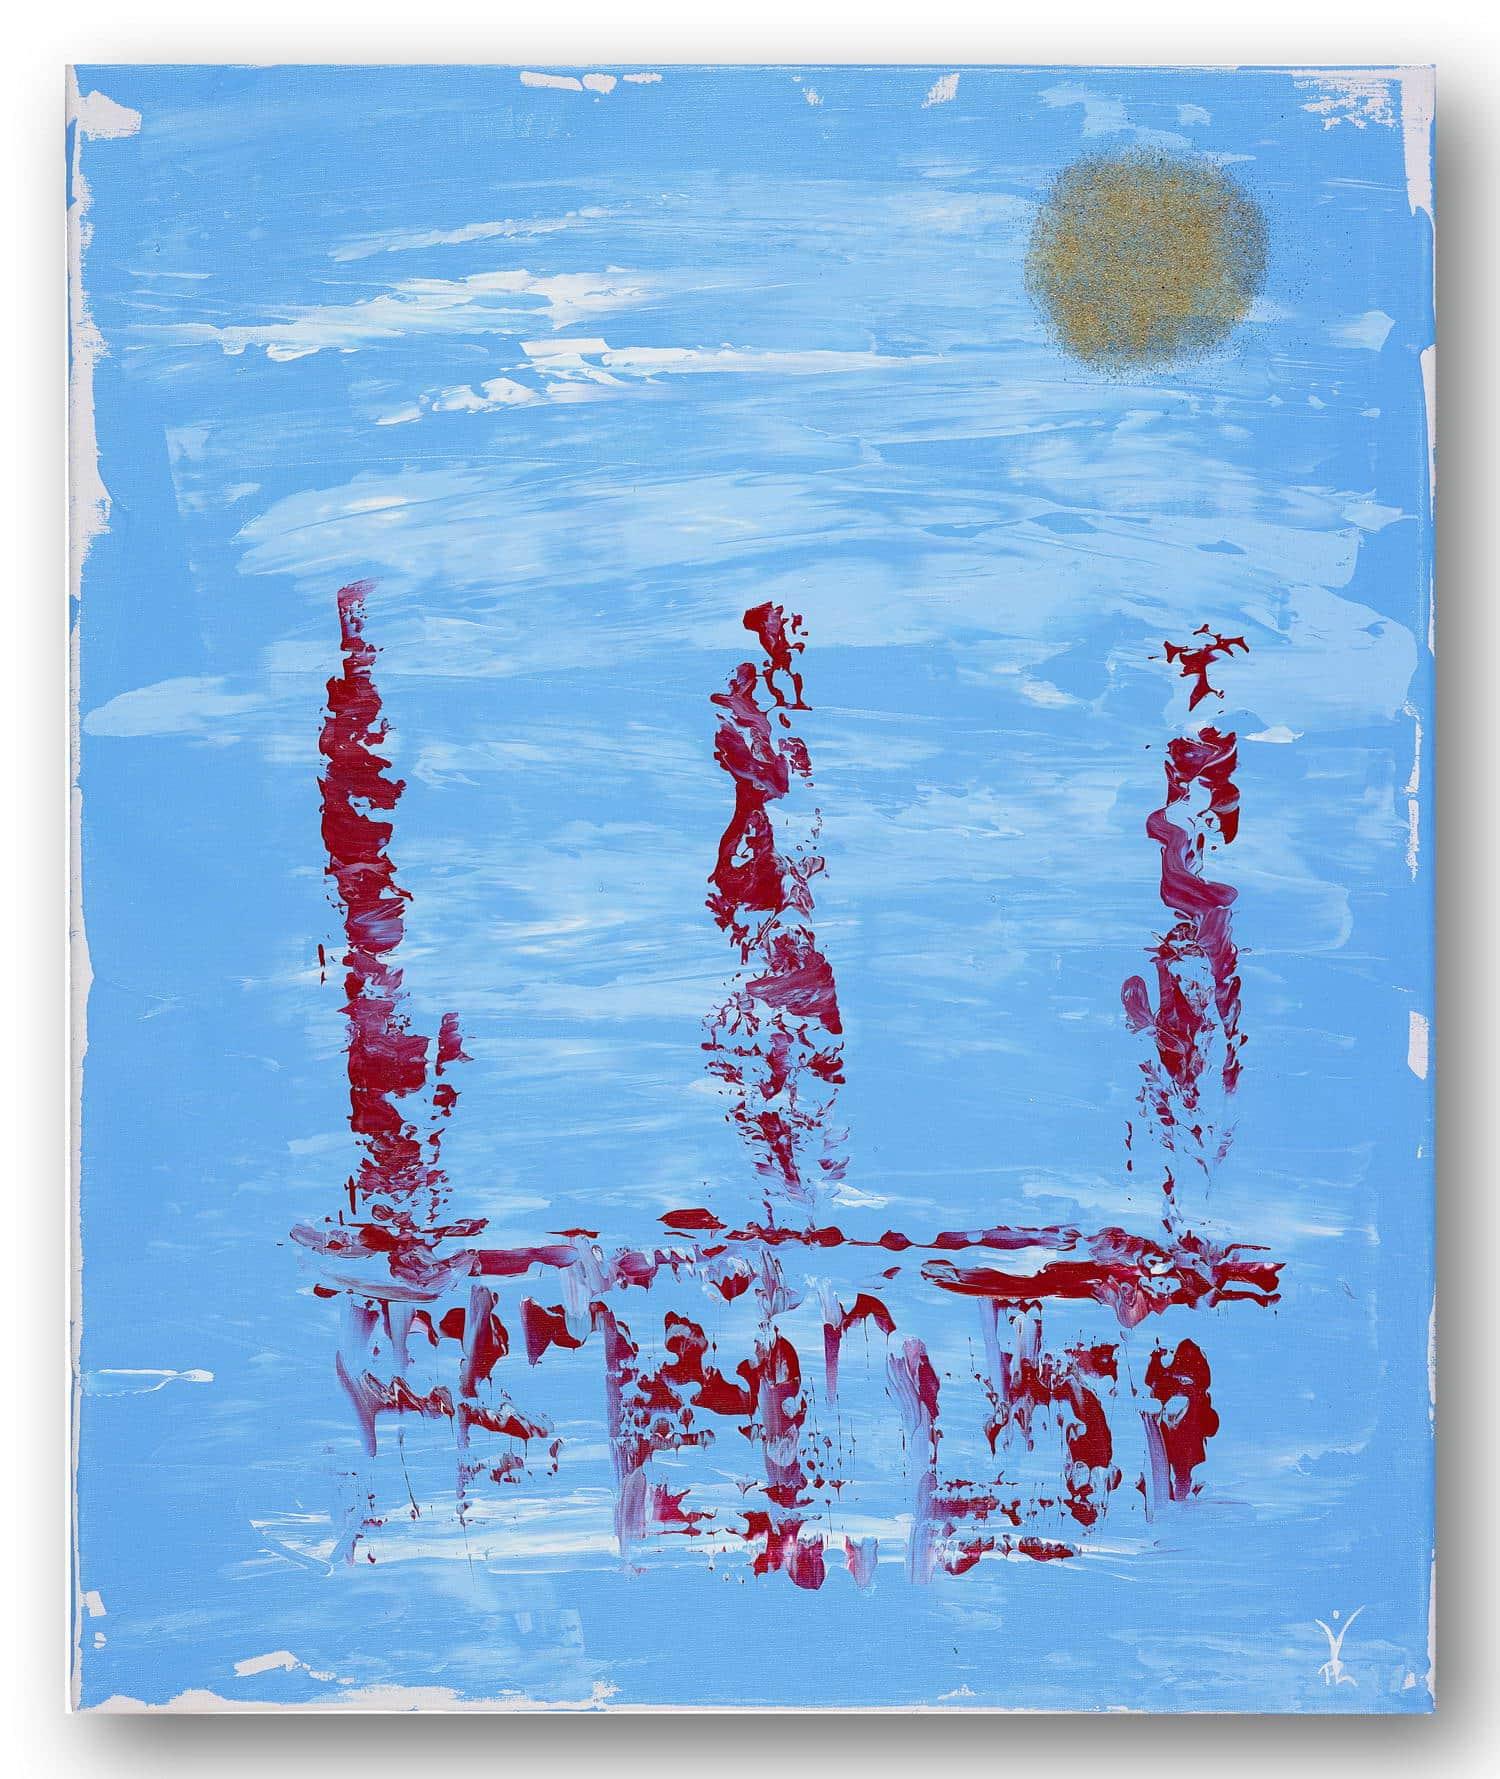 Hamburger Flair - Acrylic / Canvas 50 x 60 cm, 19.7 x 23.6 inch